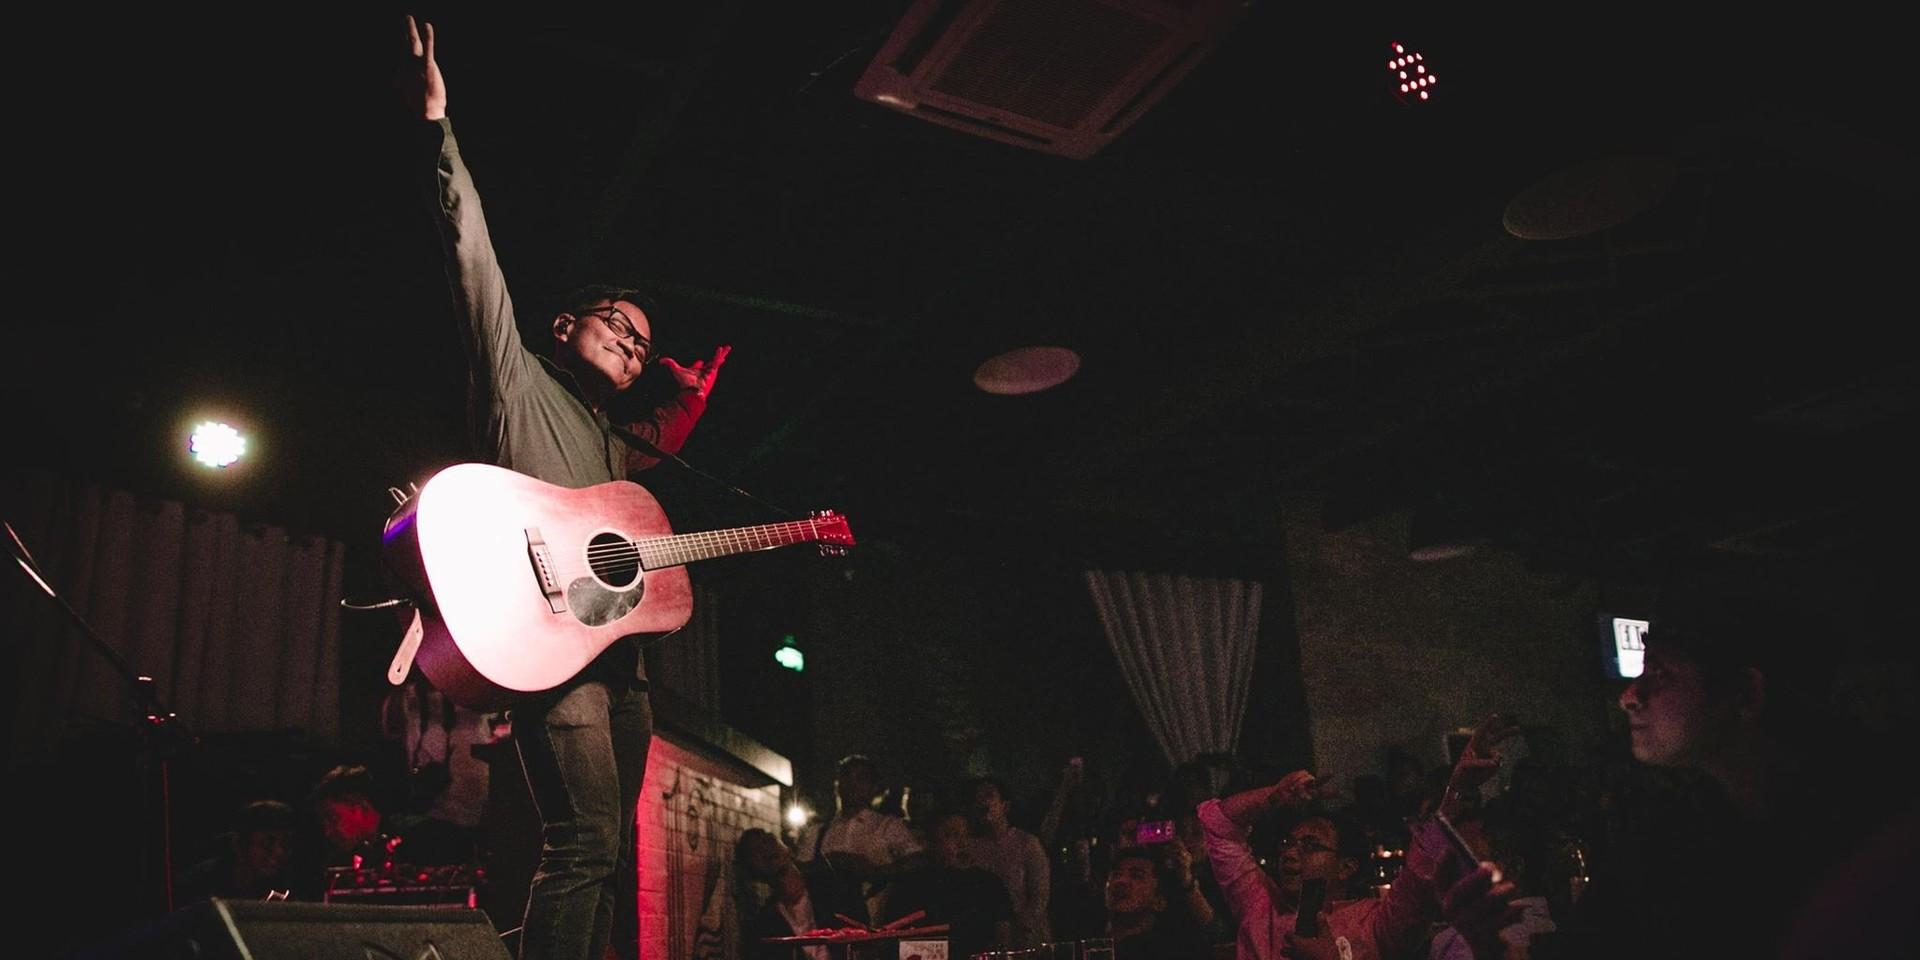 Ebe Dancel to celebrate Sugarfree's 20th anniversary with 2 shows